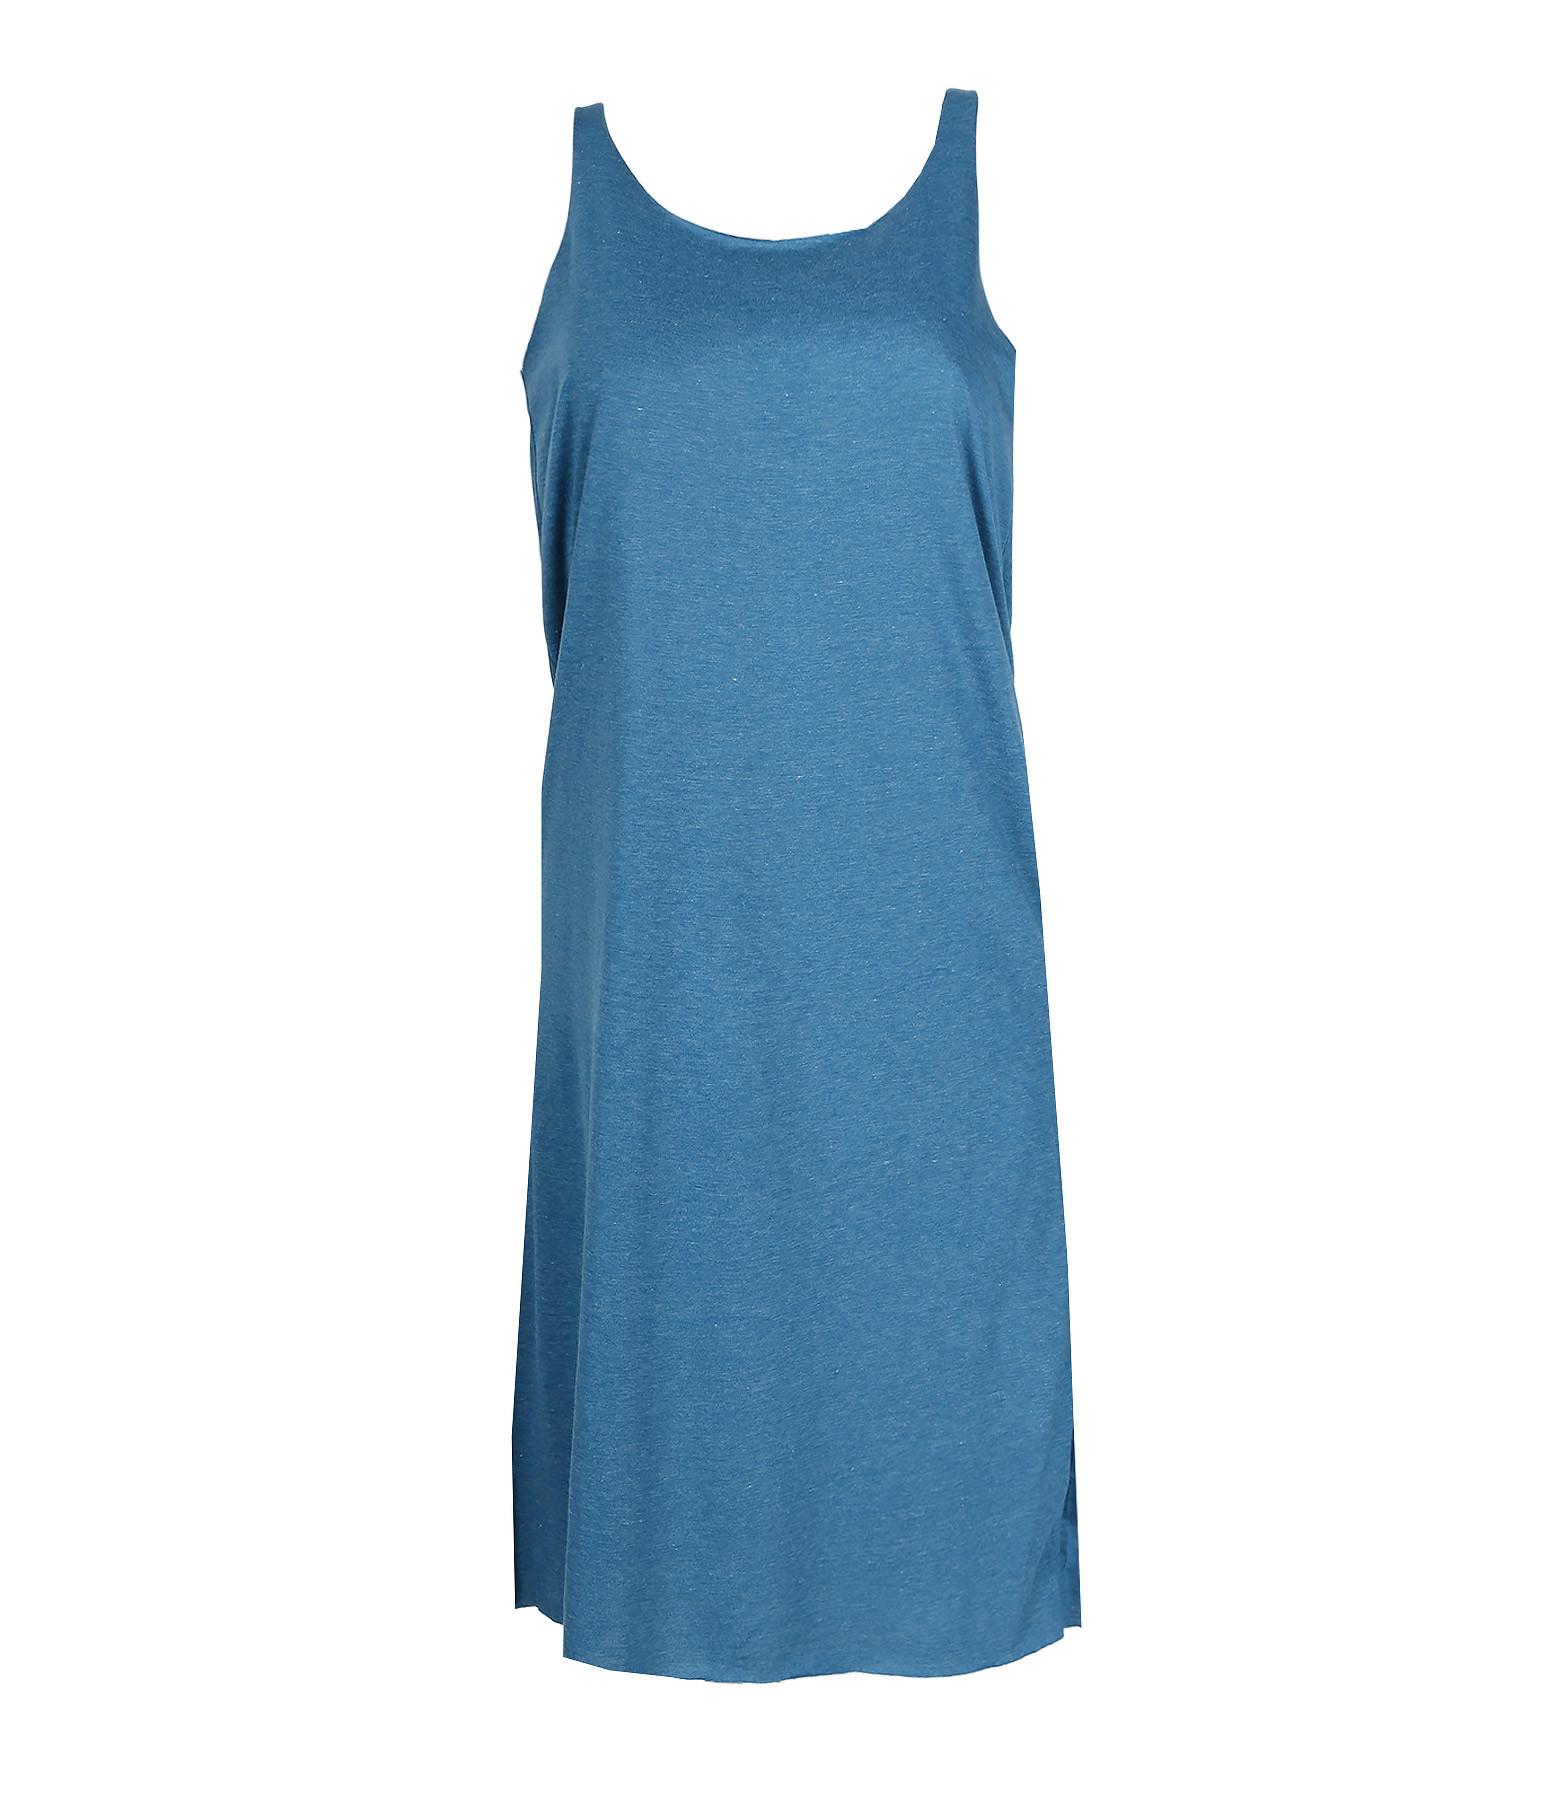 Robe Bretelles Croisées Turquoise - LULLI BASIC